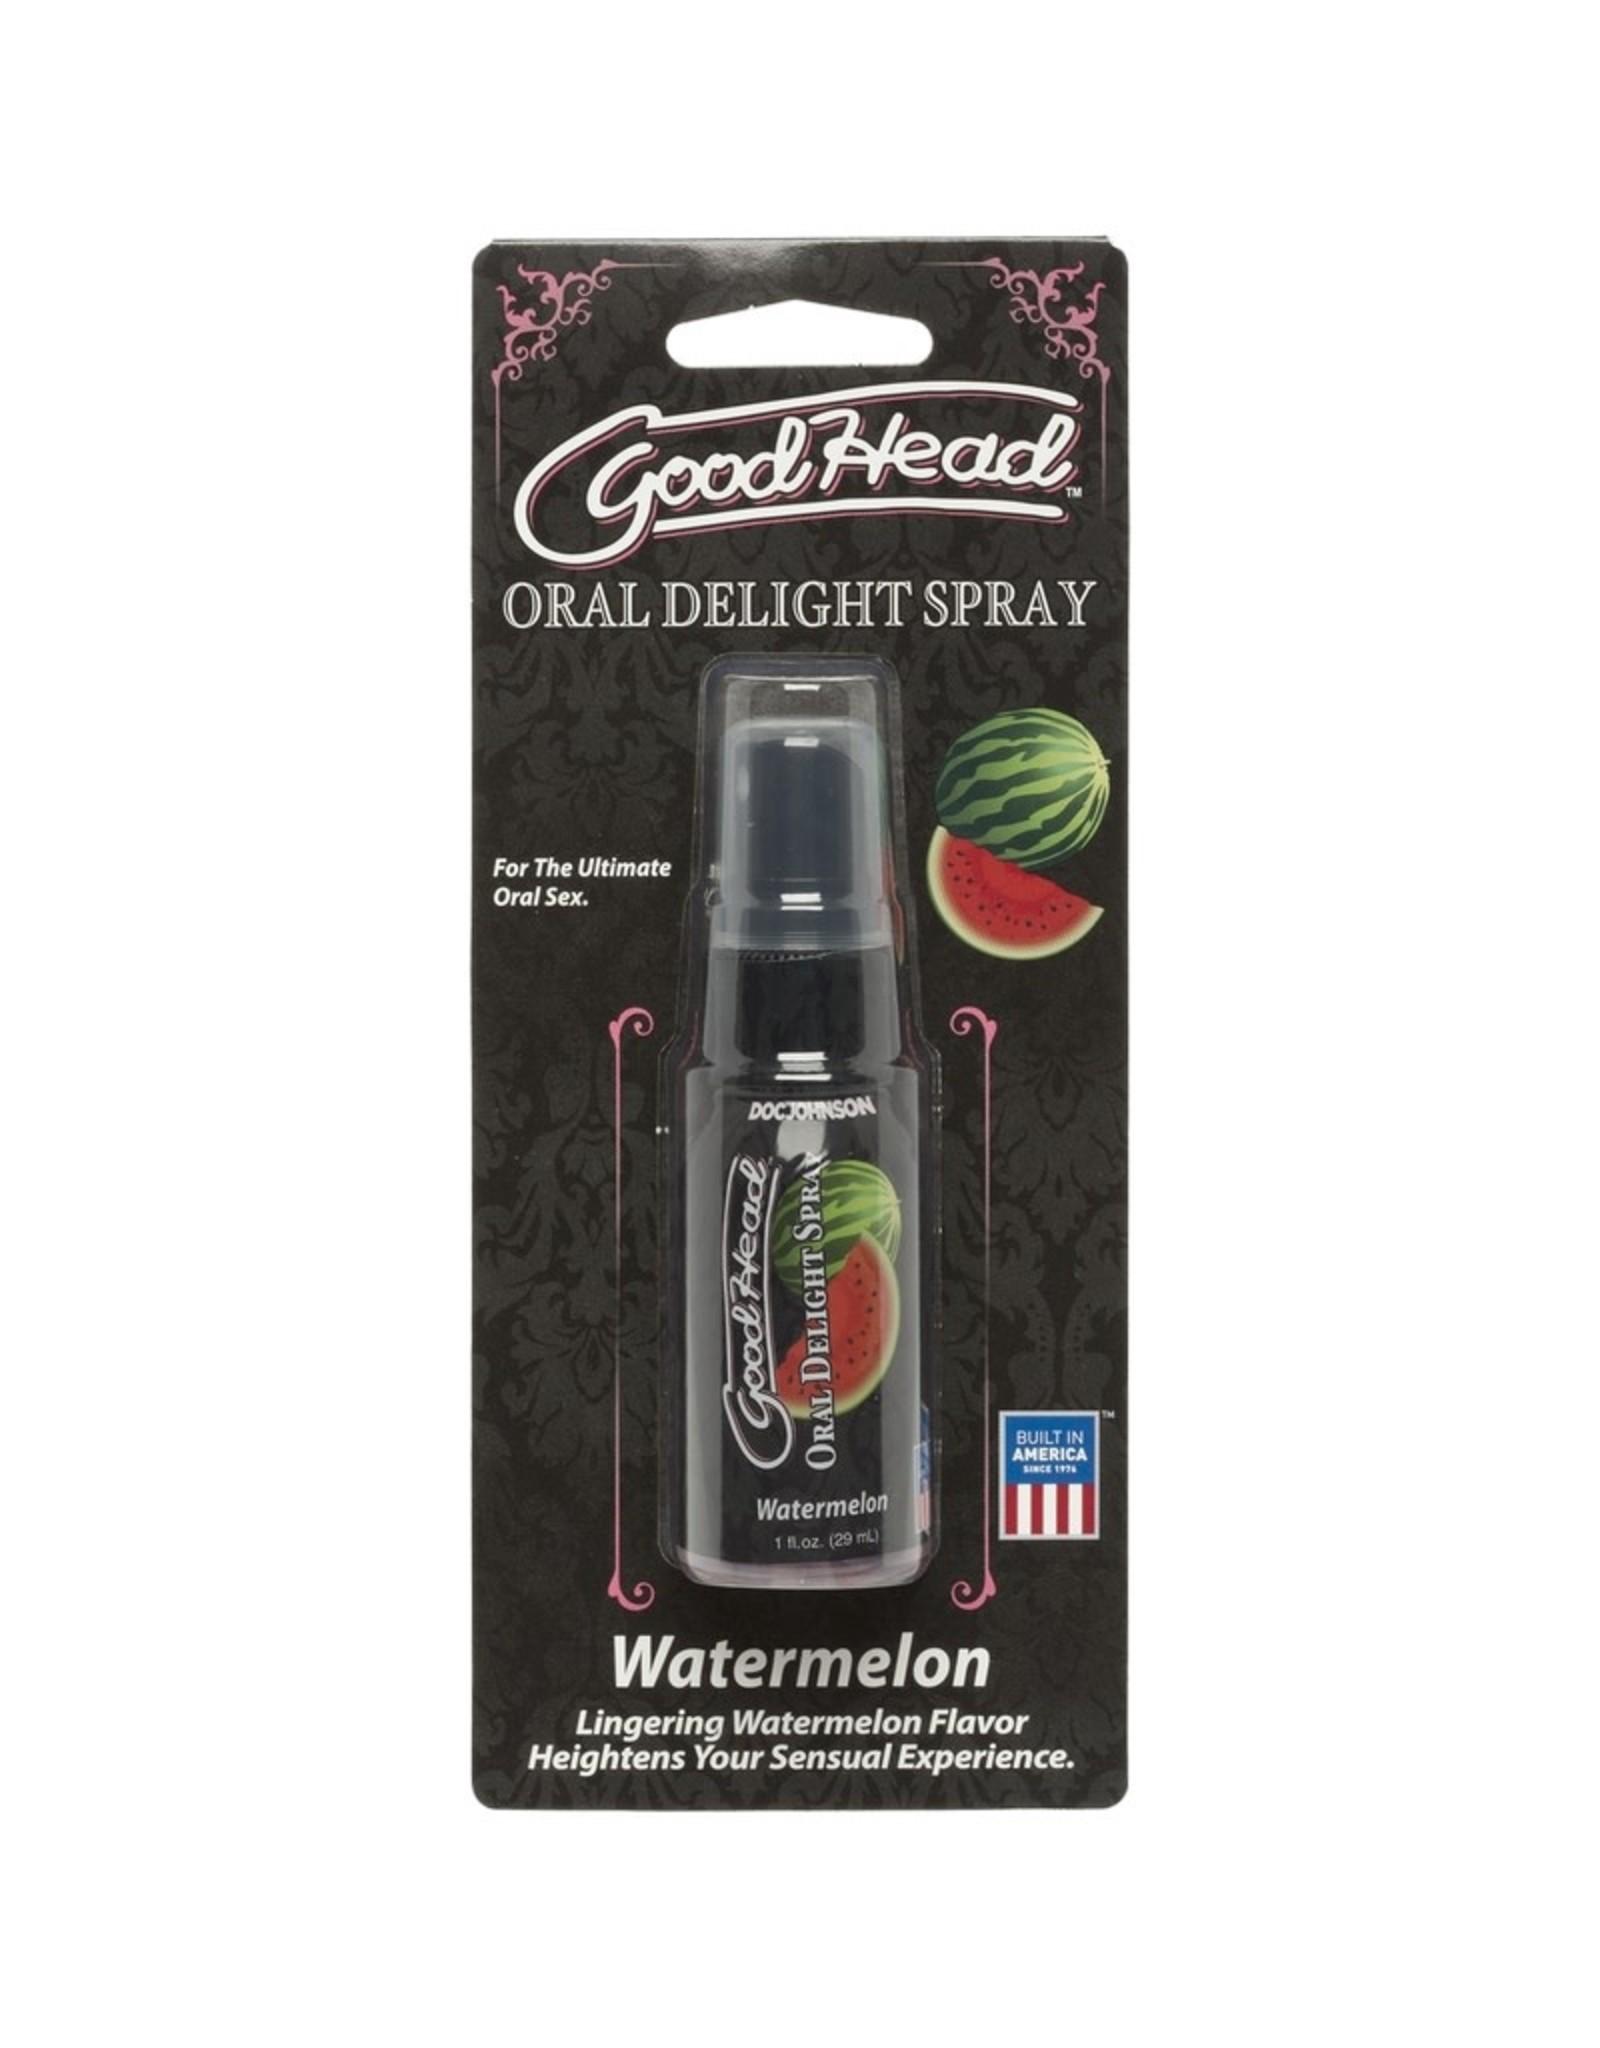 Doc Johnson Good Head - Oral Delight Spray - Watermelon - 1 oz